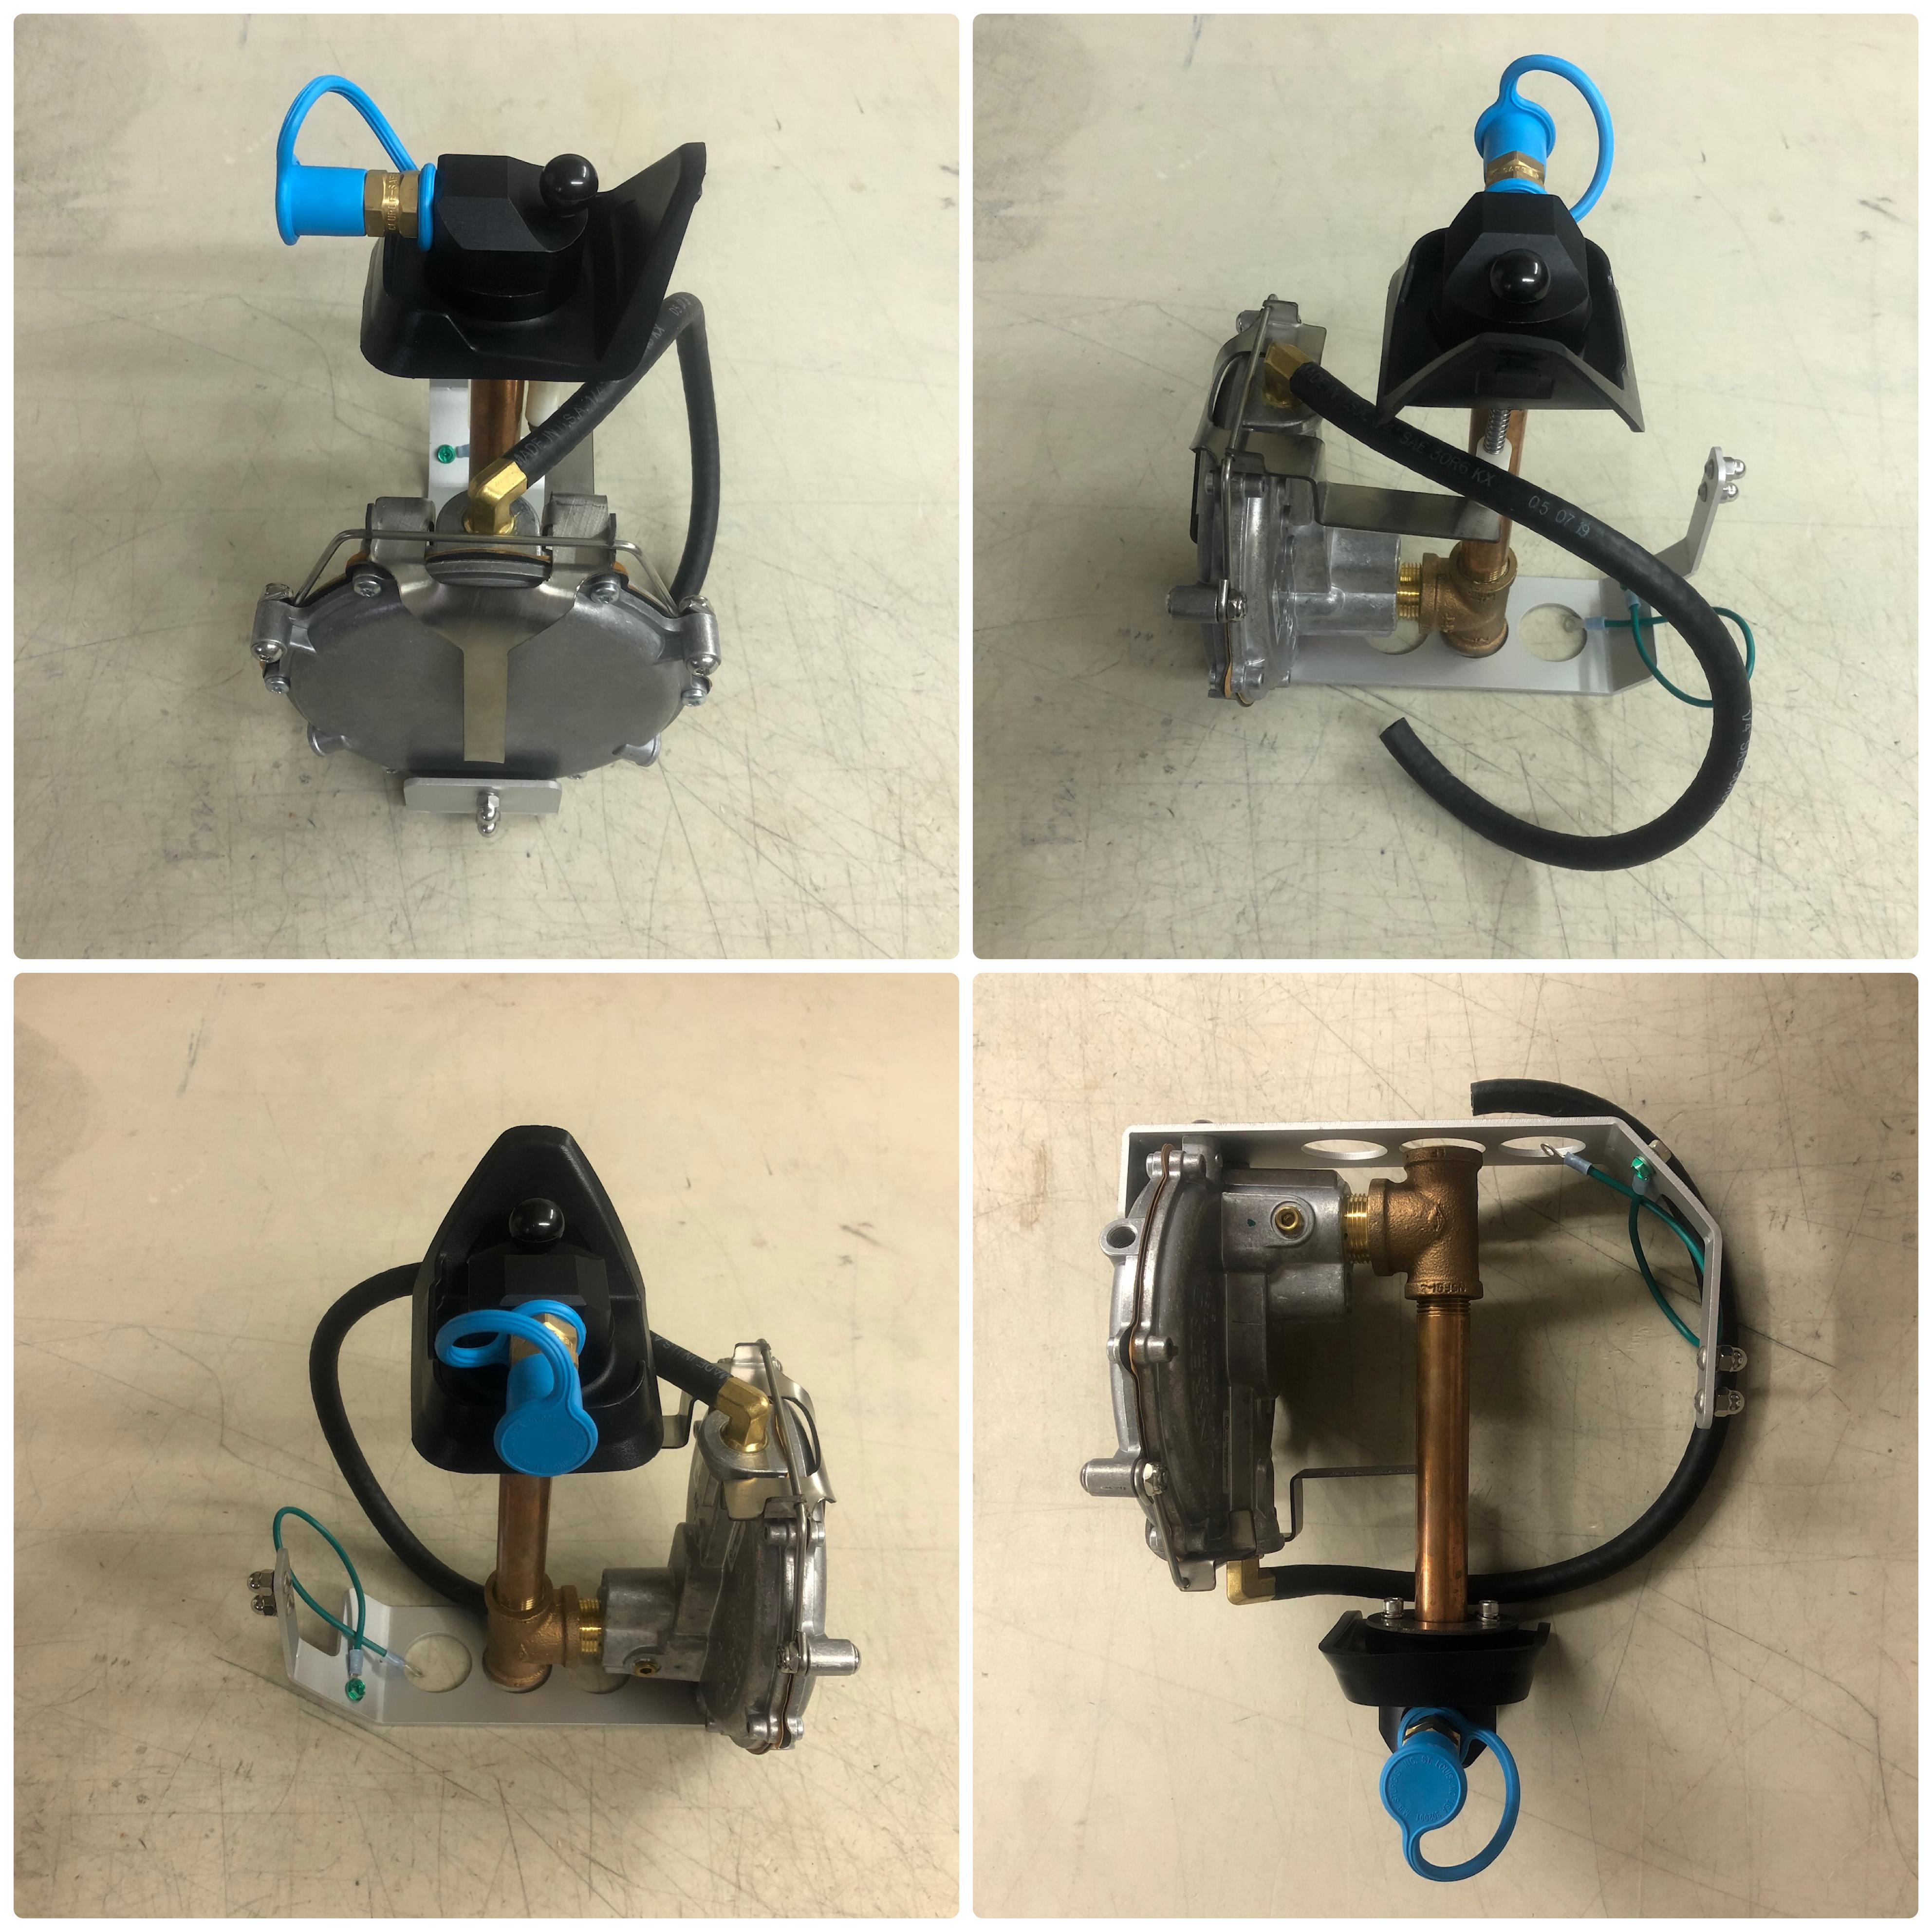 Genconnex propane kit